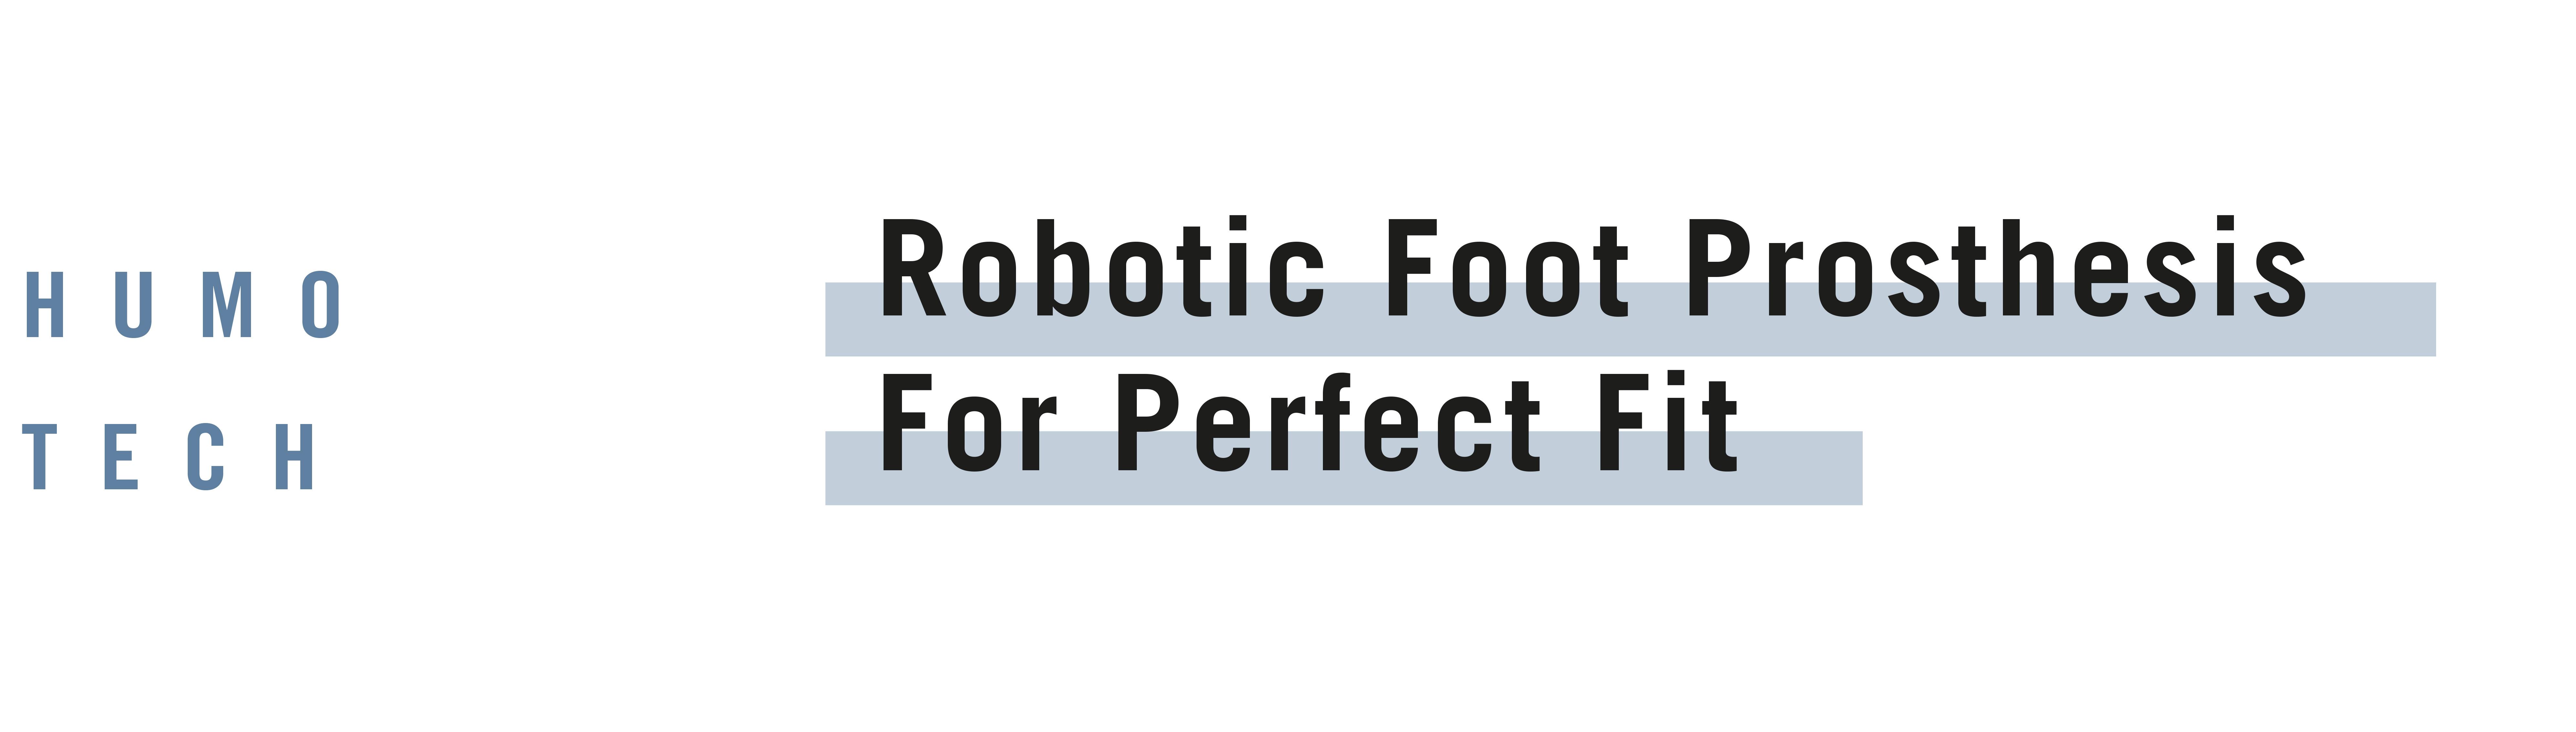 Robotic Foot